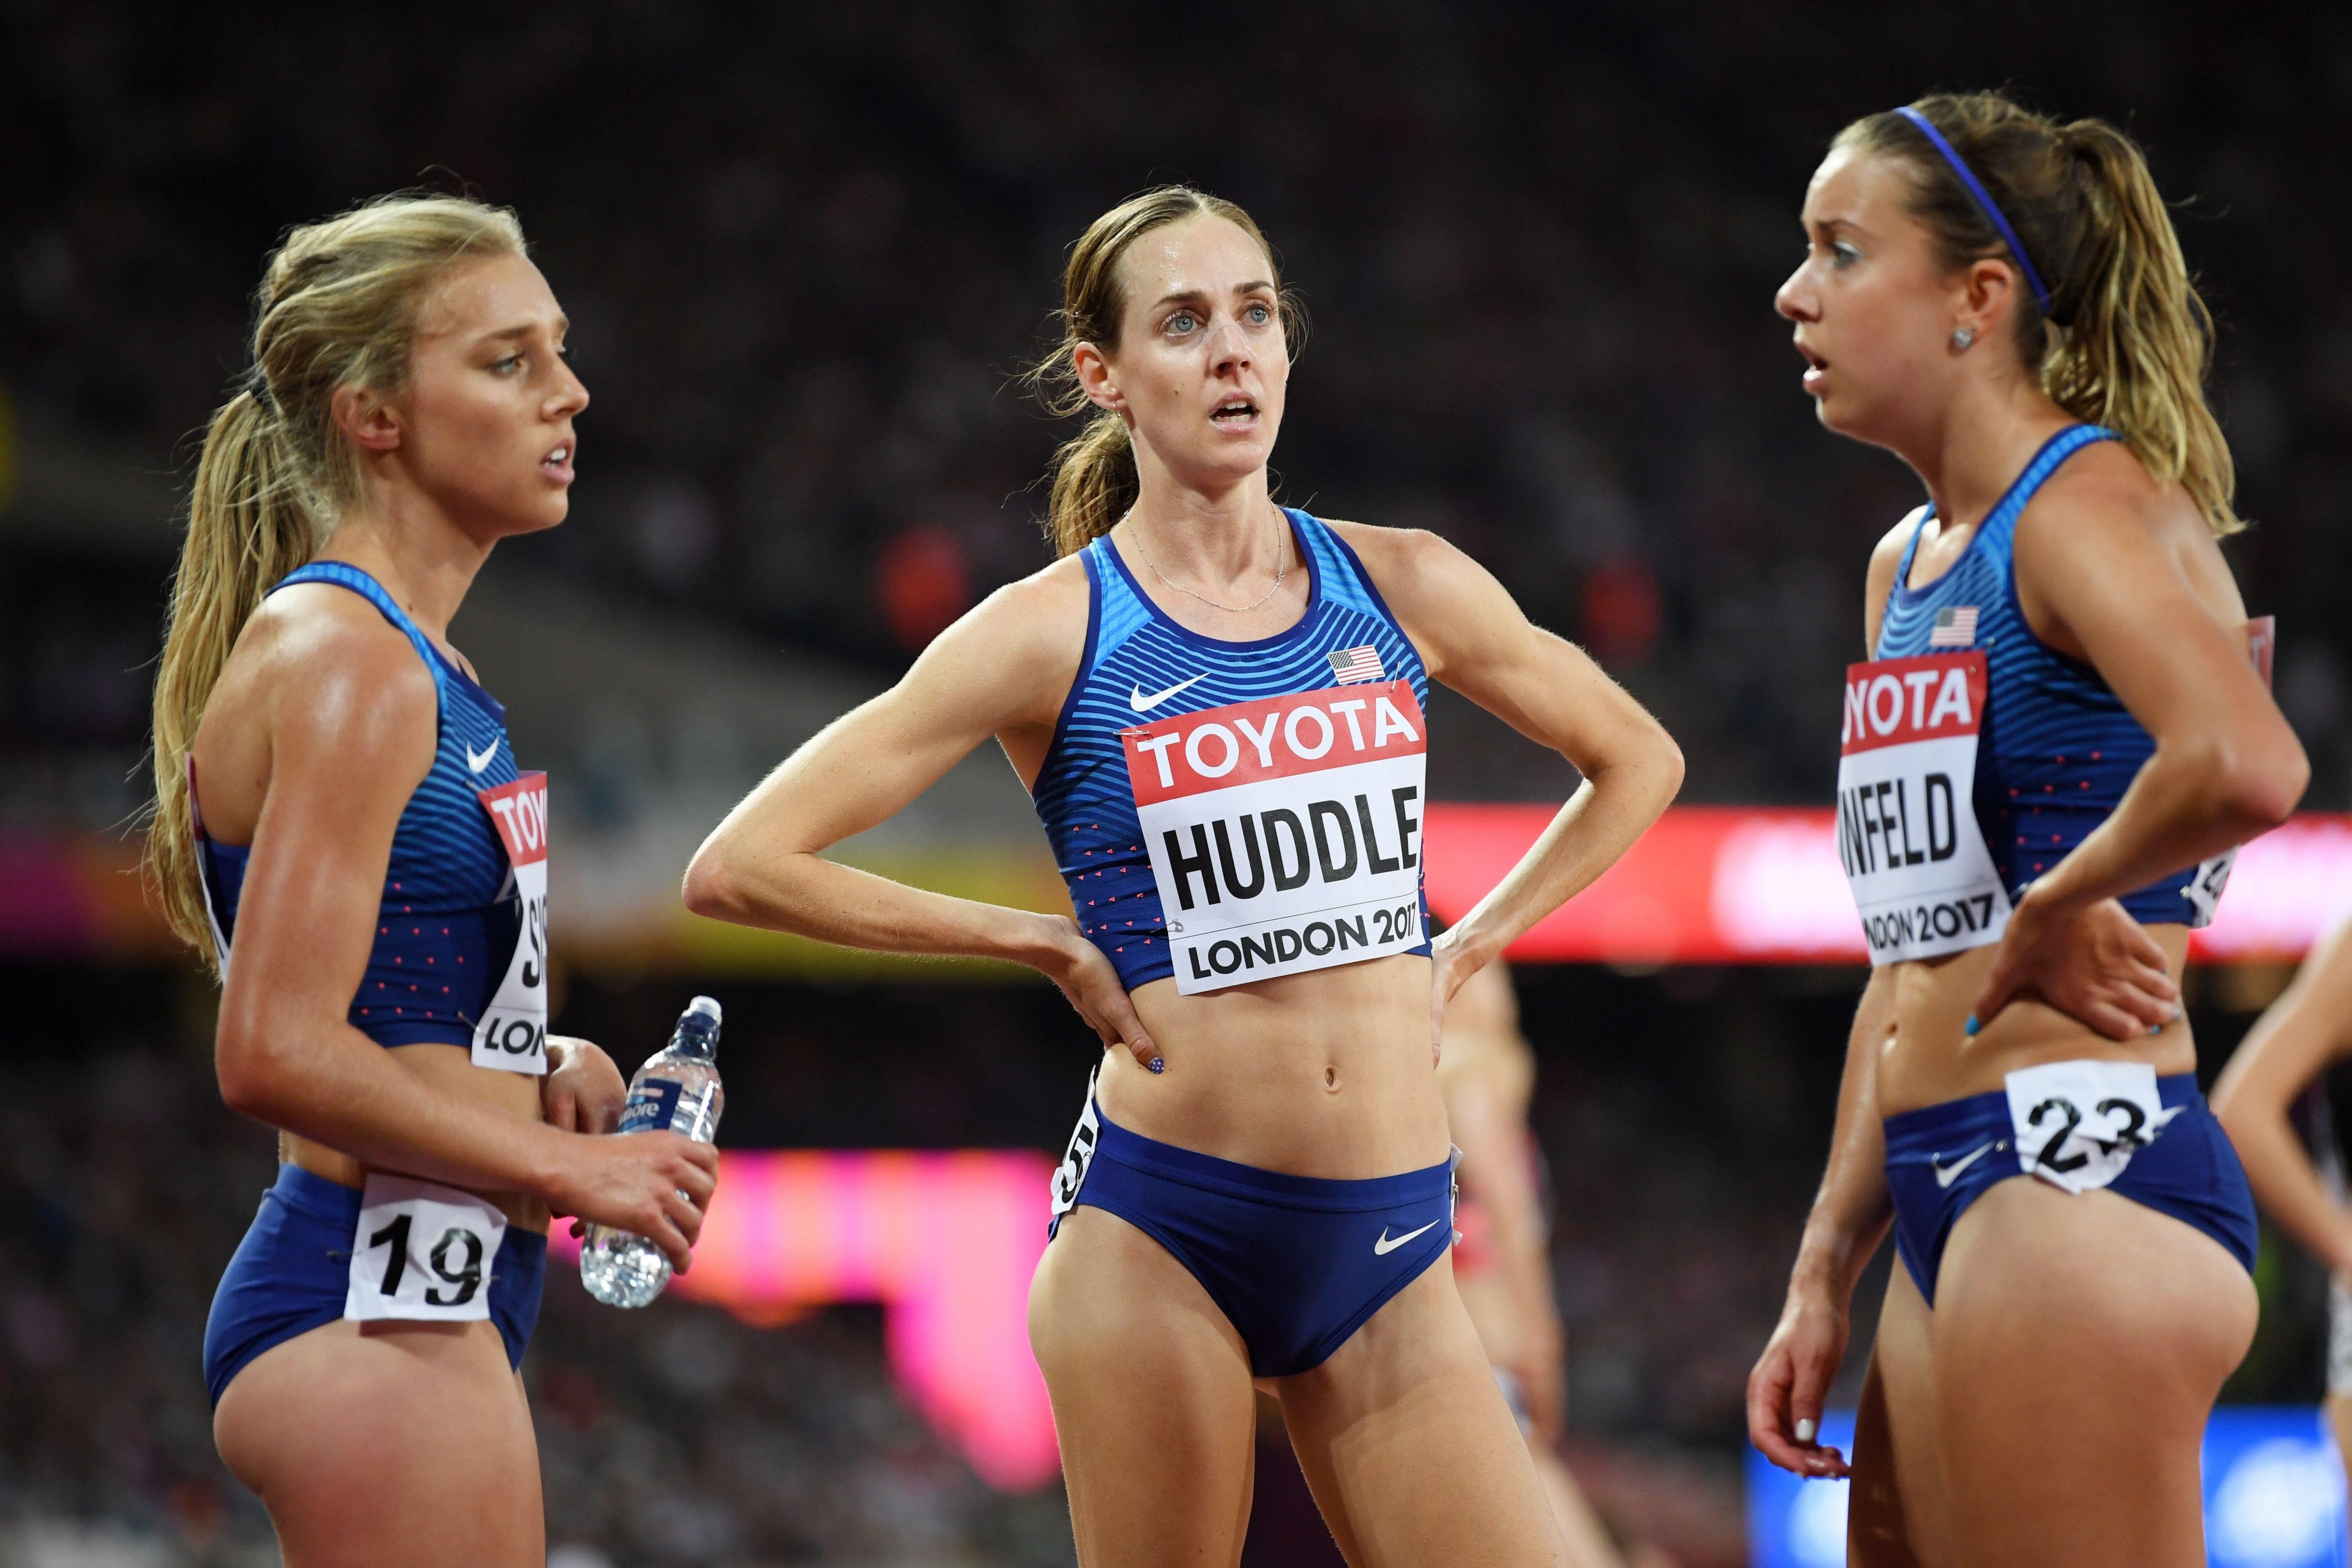 Molly Huddle: A Training Log A Training Log Medium